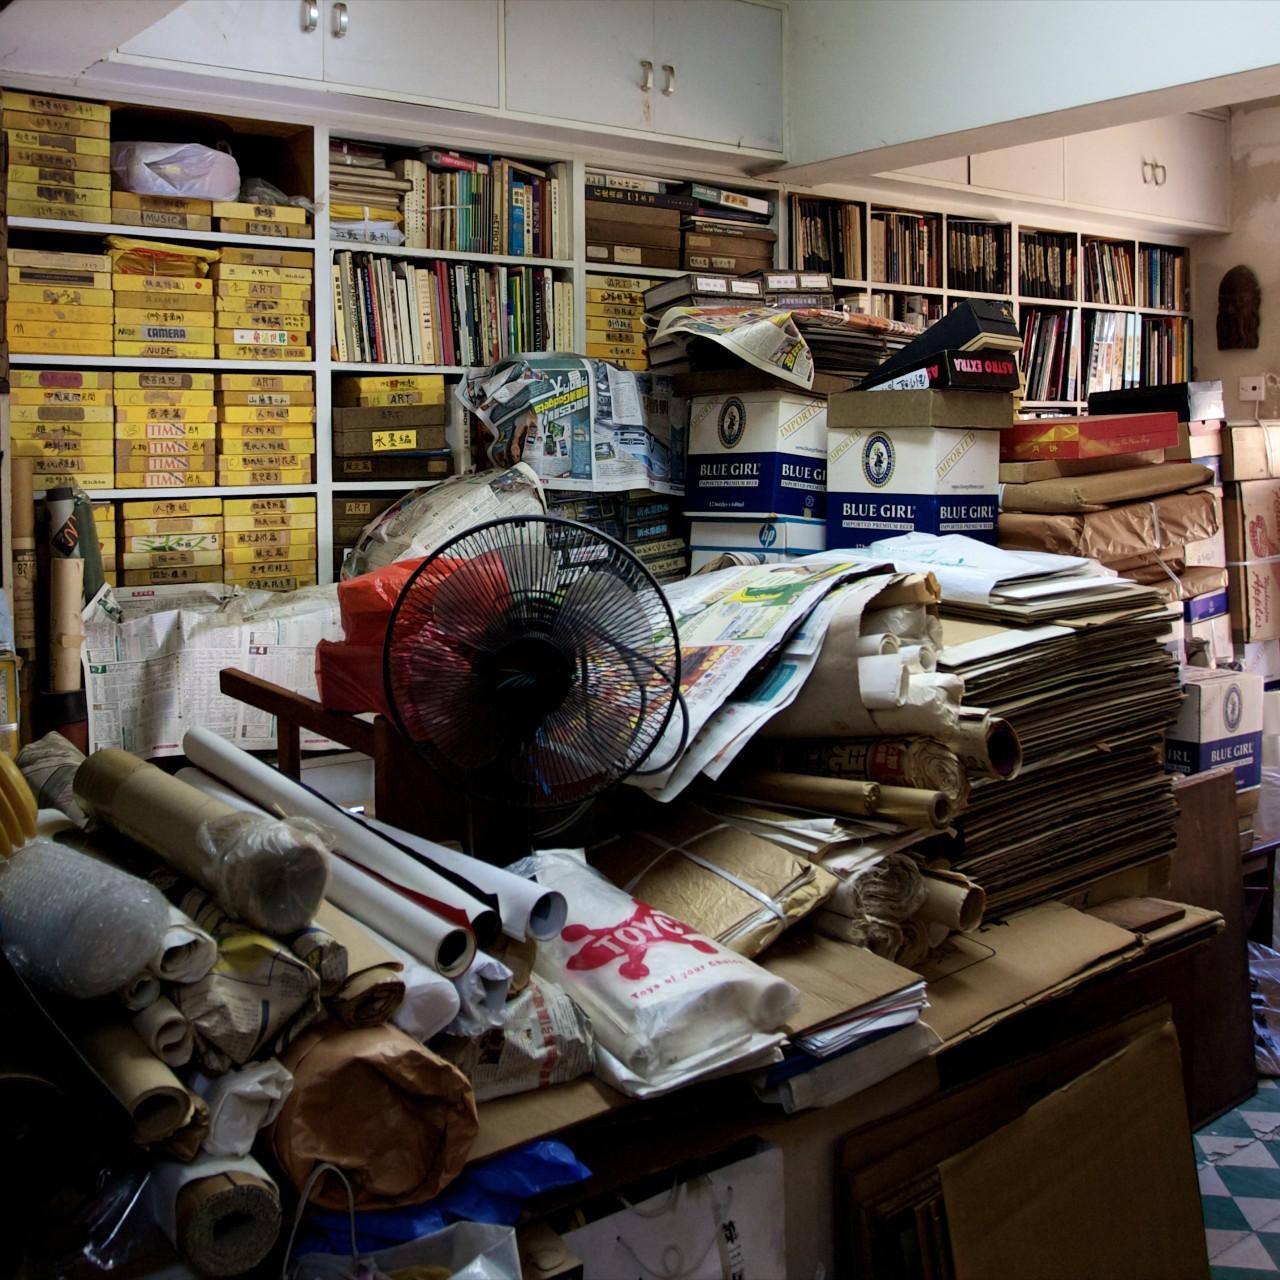 Hong Kong artist Ha Bik-chuen's archives made available for